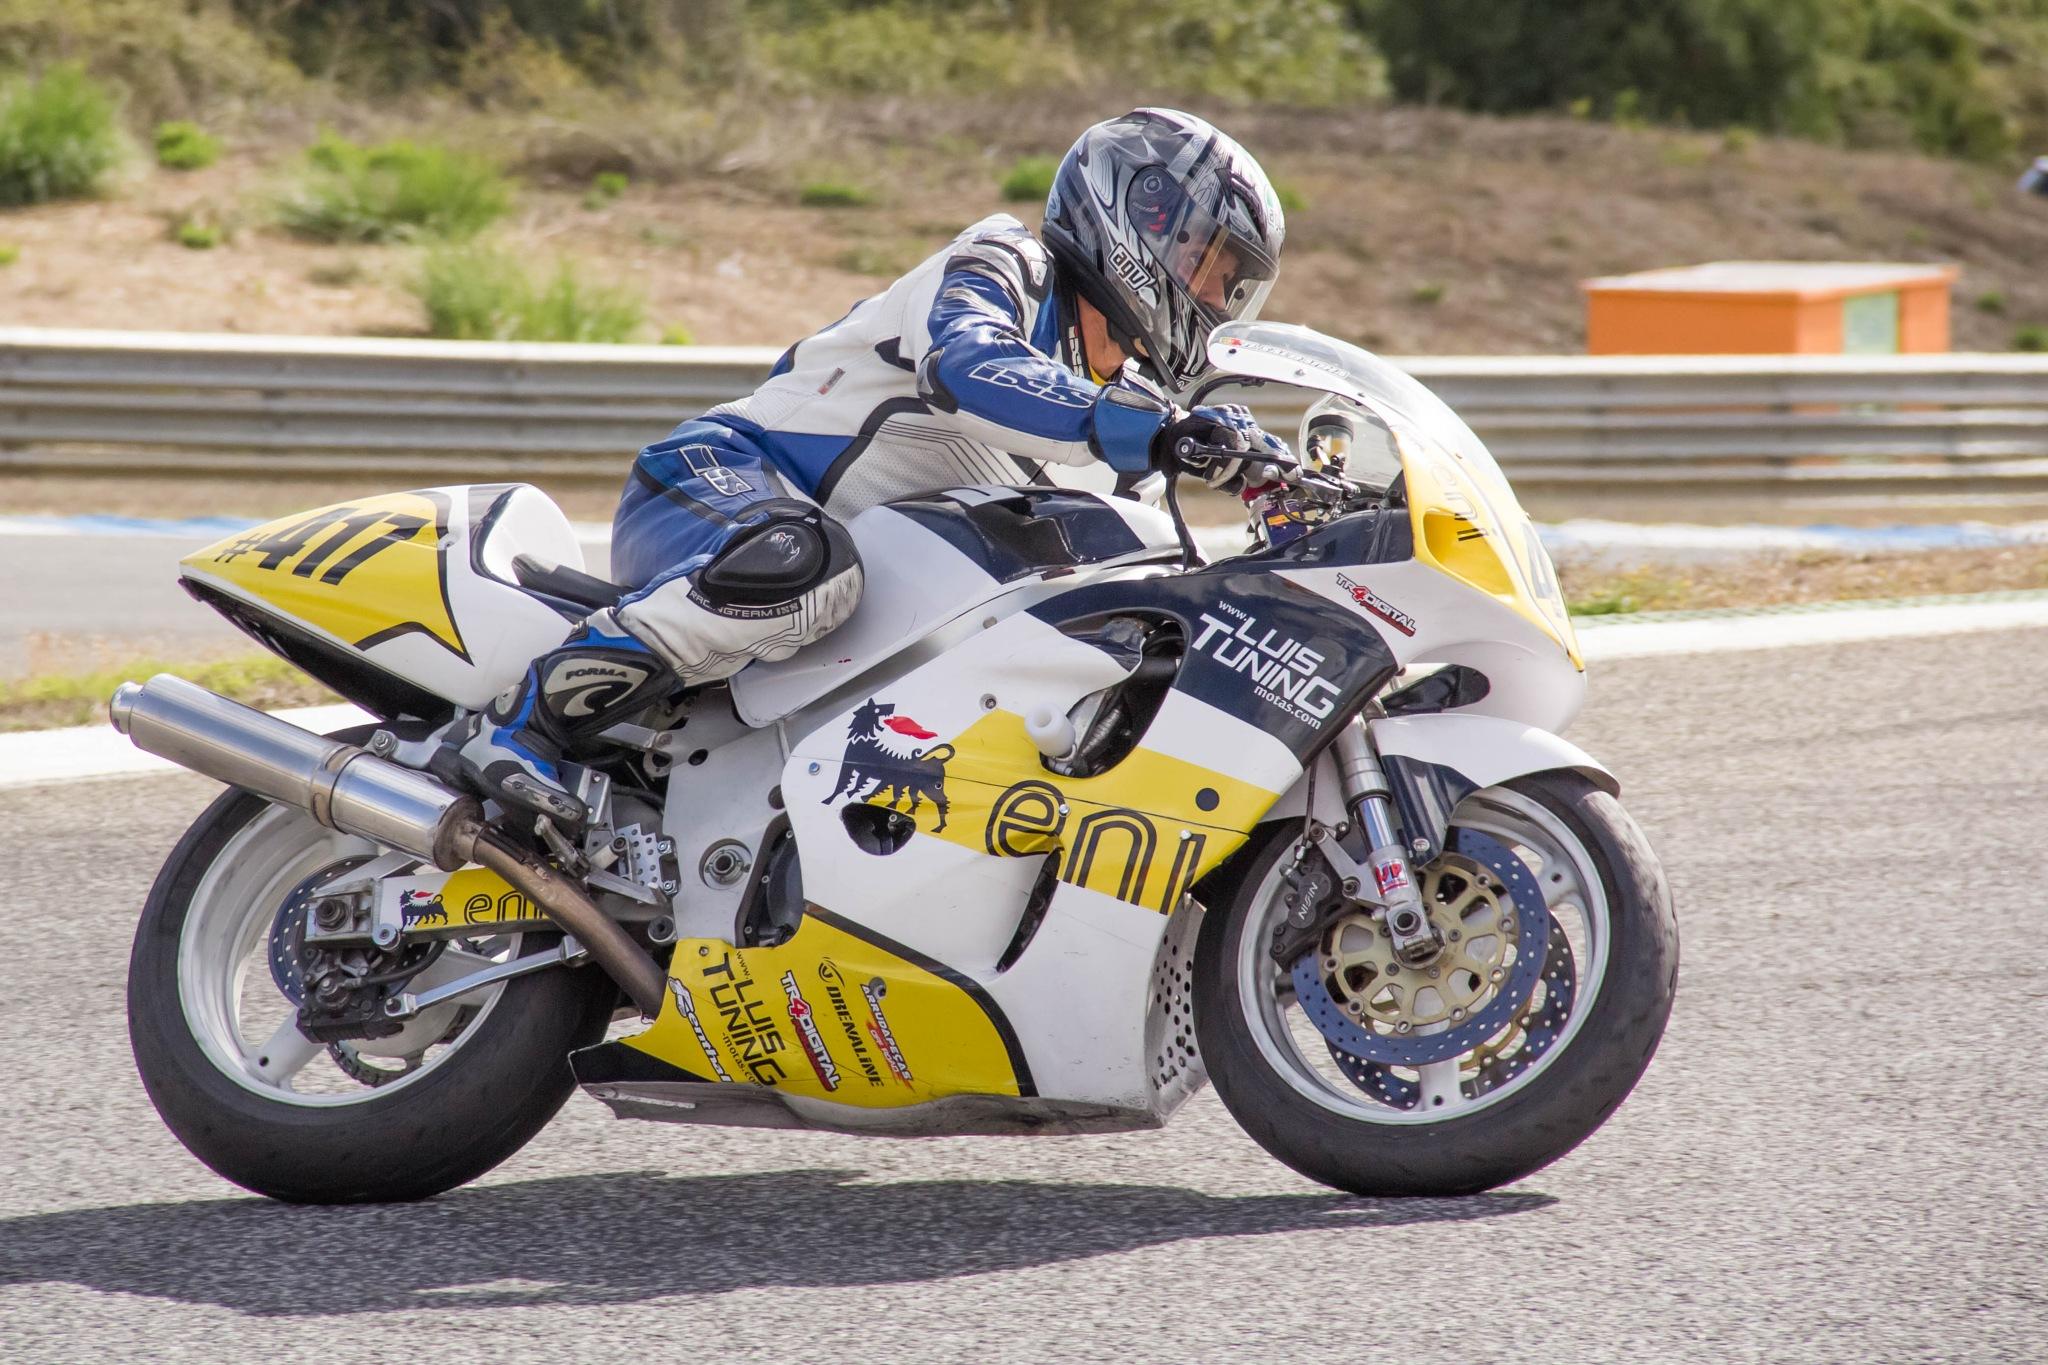 Motocycling by Carla Dias